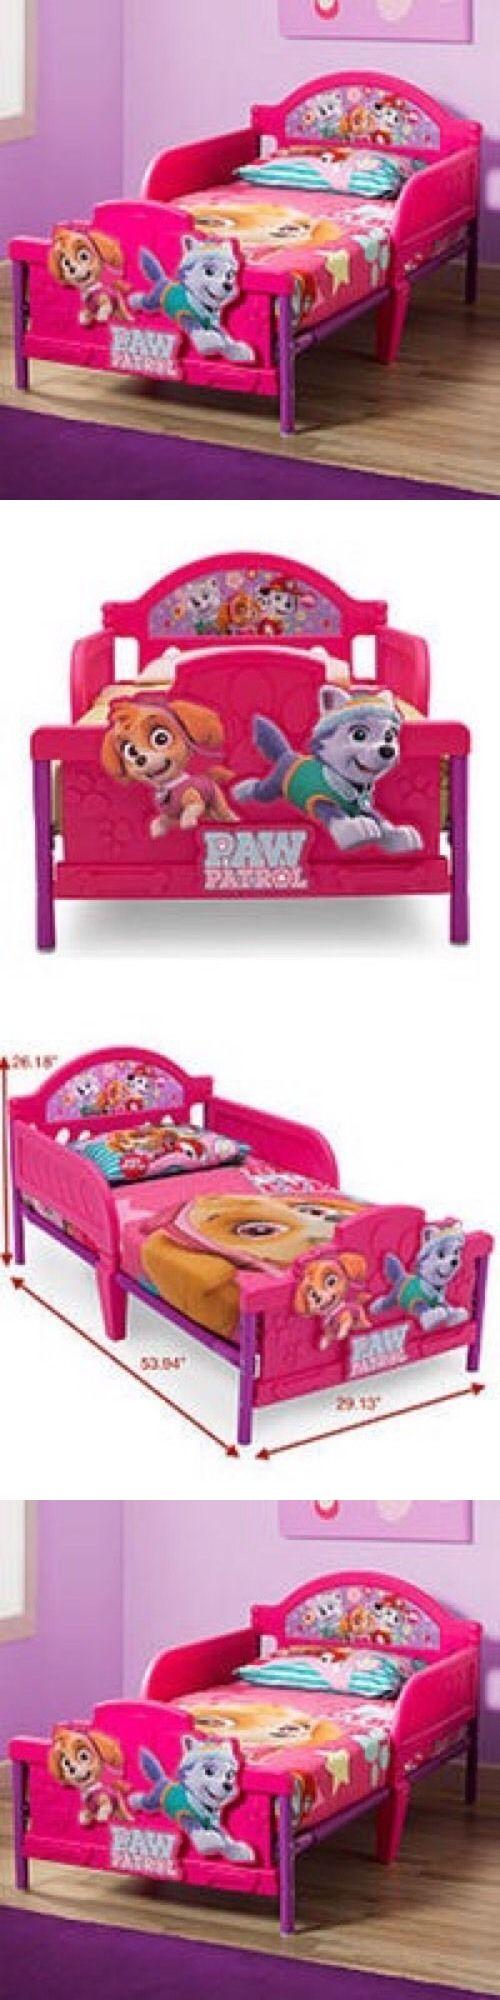 best 20+ pink toddler bed ideas on pinterest | toddler girl beds